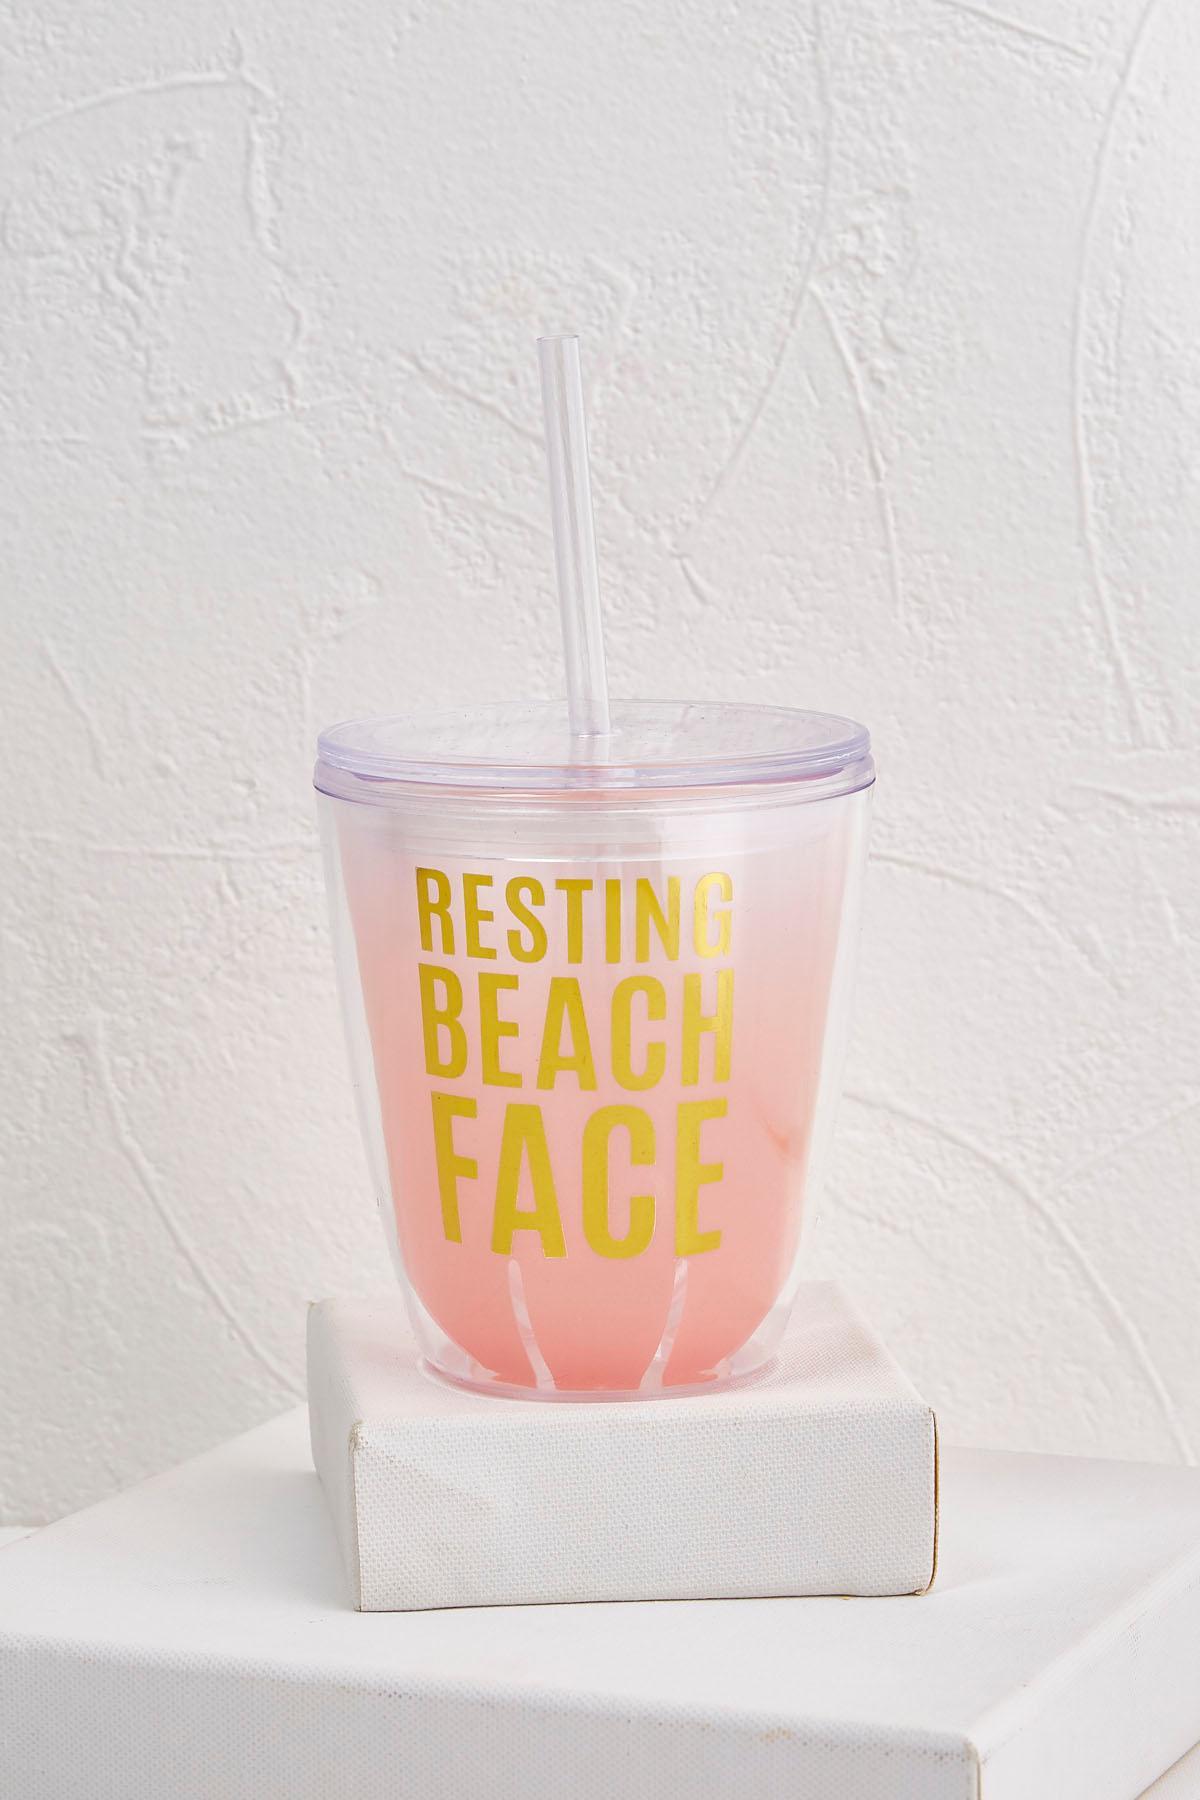 Resting Beach Face Tumbler